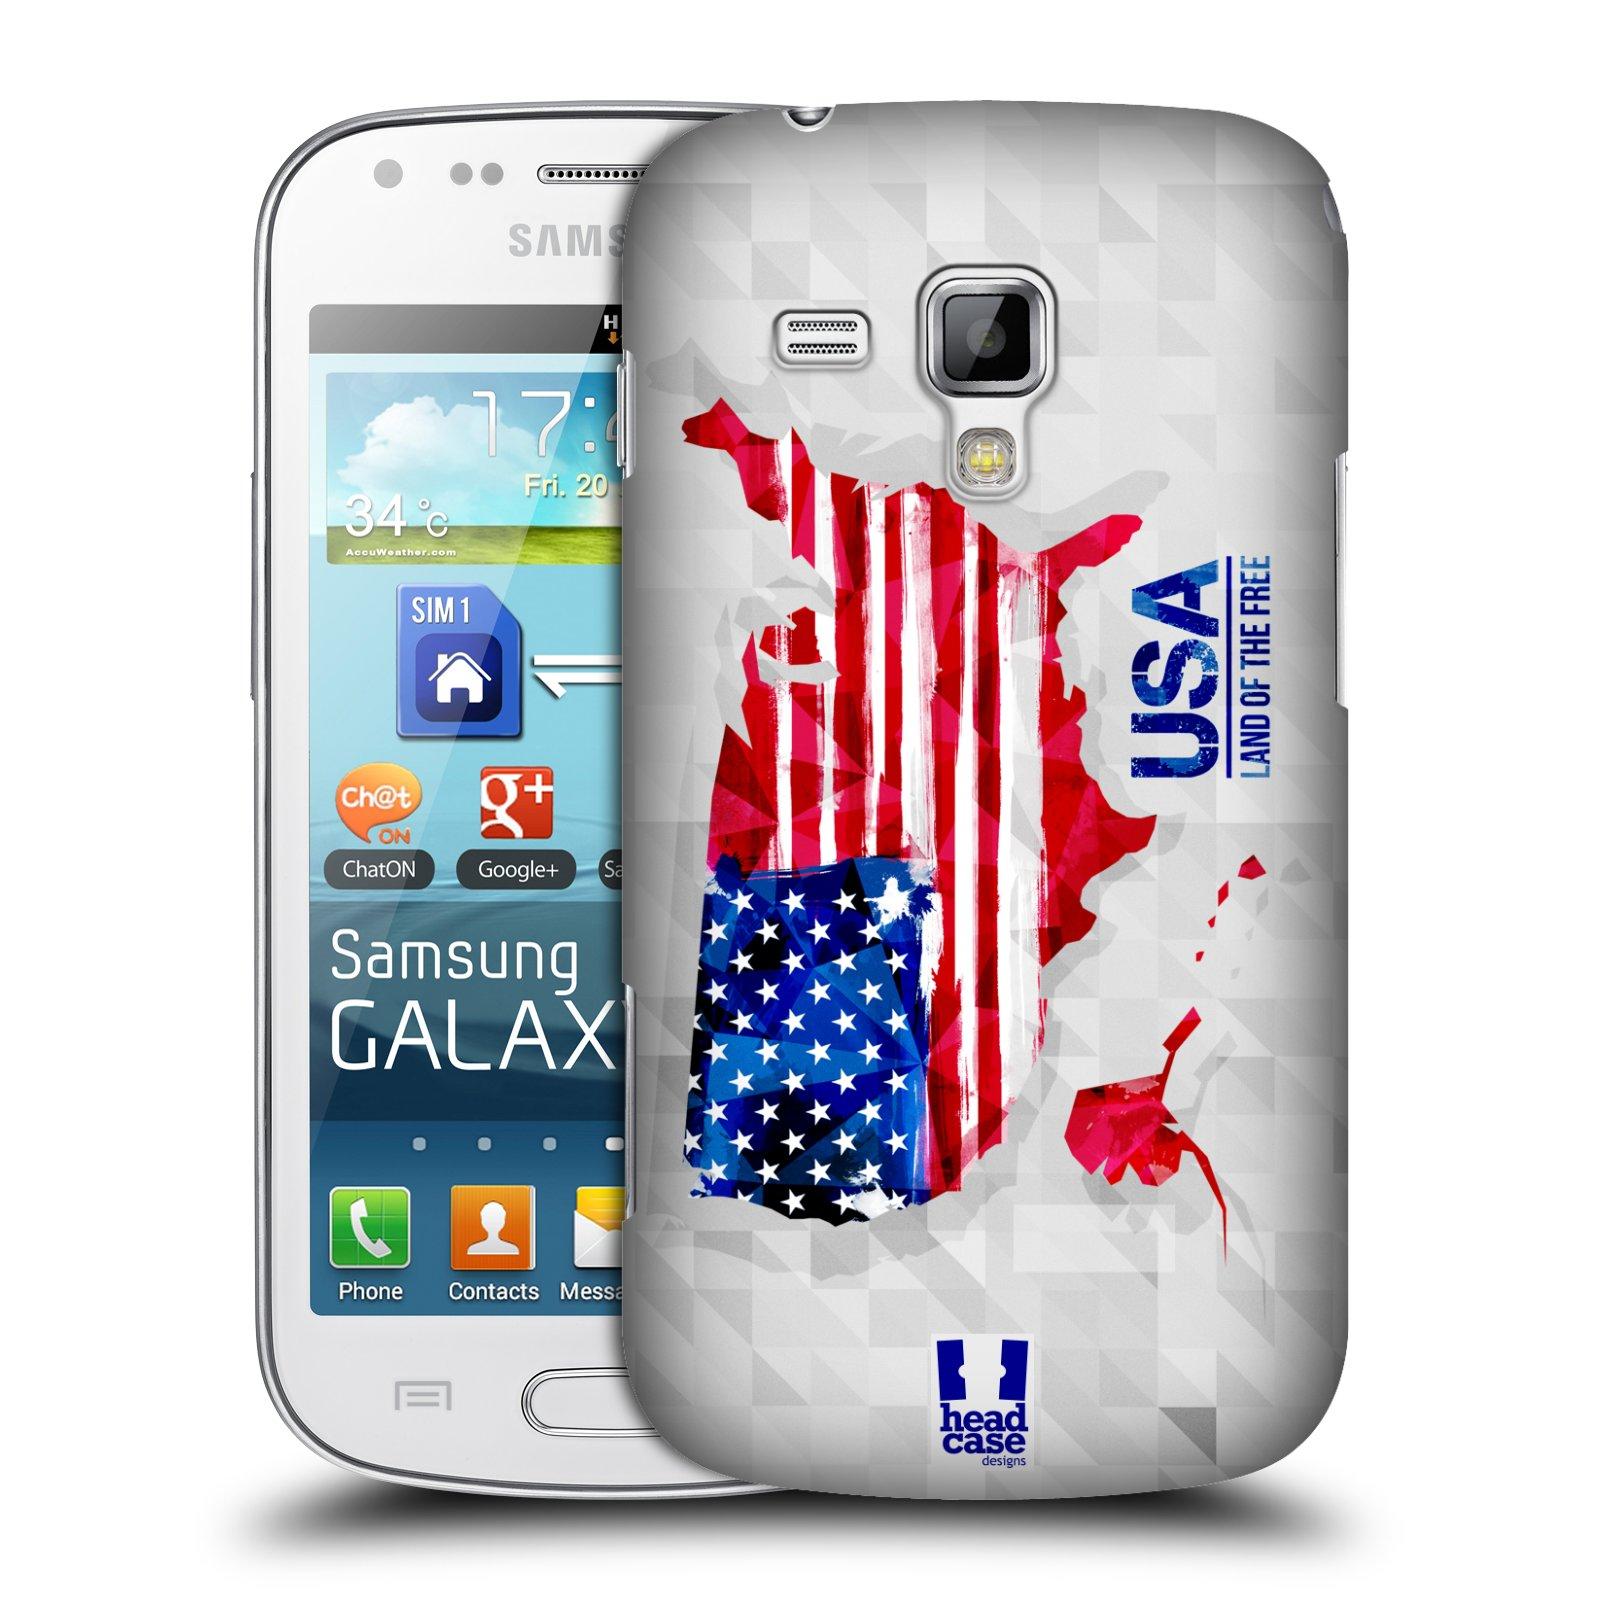 Plastové pouzdro na mobil Samsung Galaxy Trend HEAD CASE GEOMAPA USA (Kryt či obal na mobilní telefon Samsung Galaxy Trend GT-S7560)